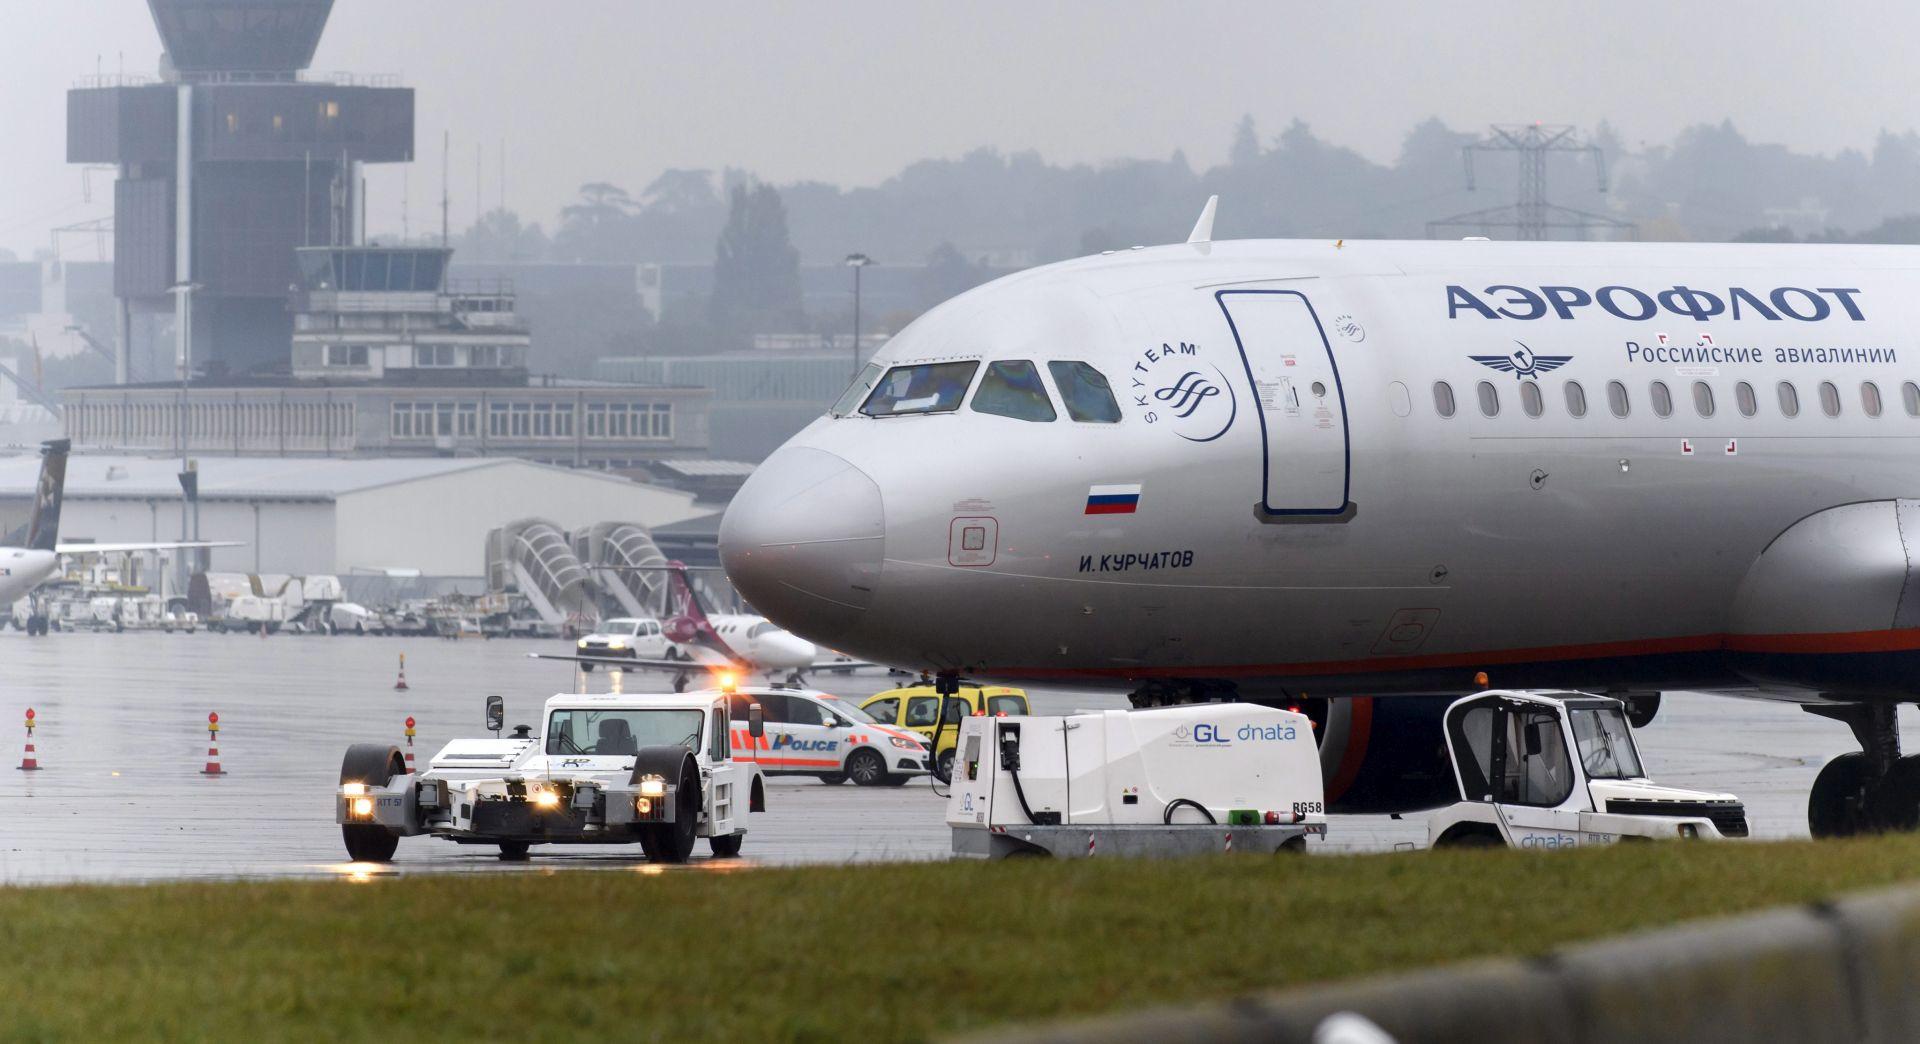 TURBULENCIJE Najmanje 27 ozlijeđenih na letu iz Moskve za Bangkok